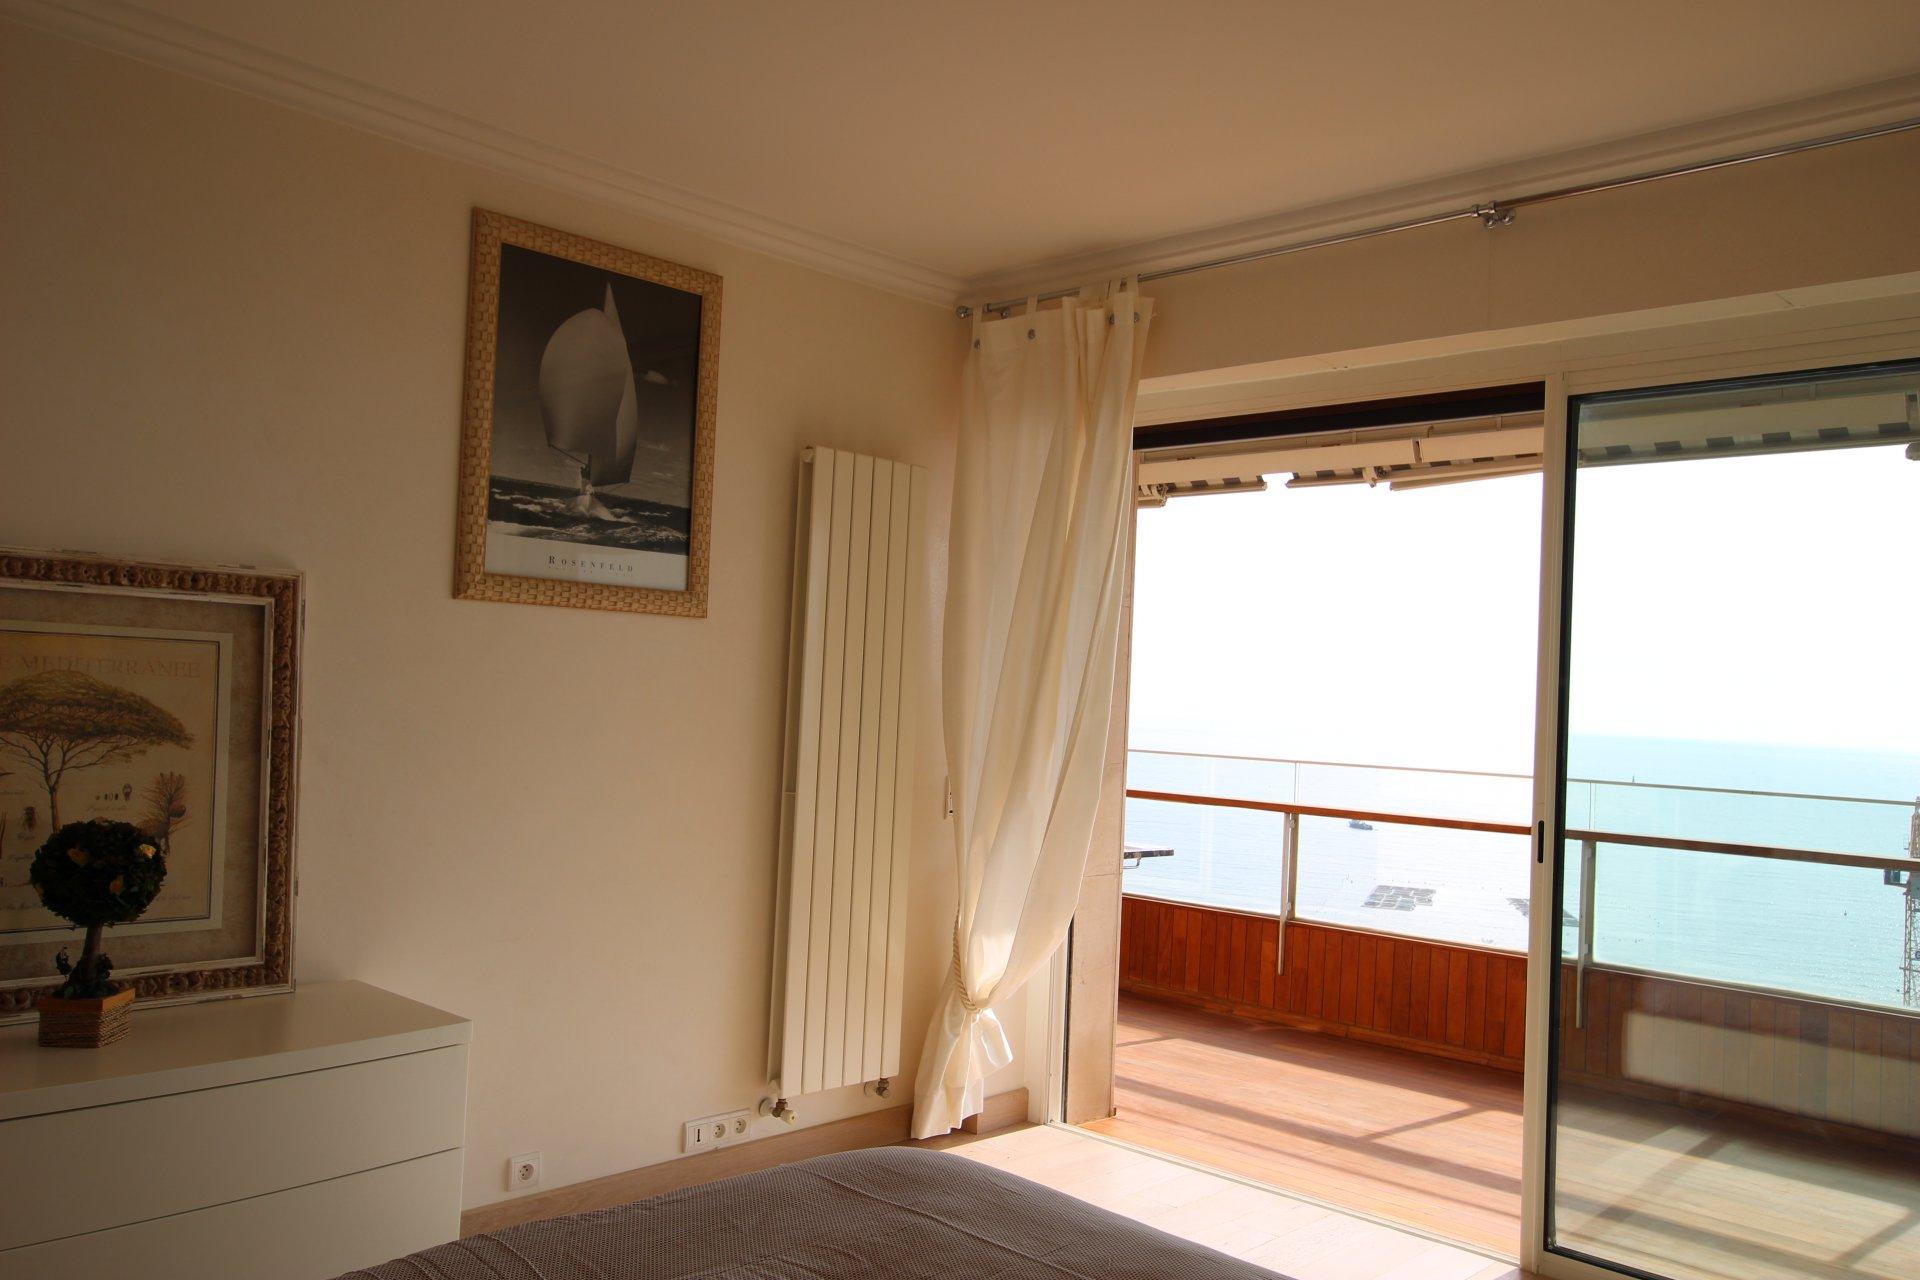 公寓 06400